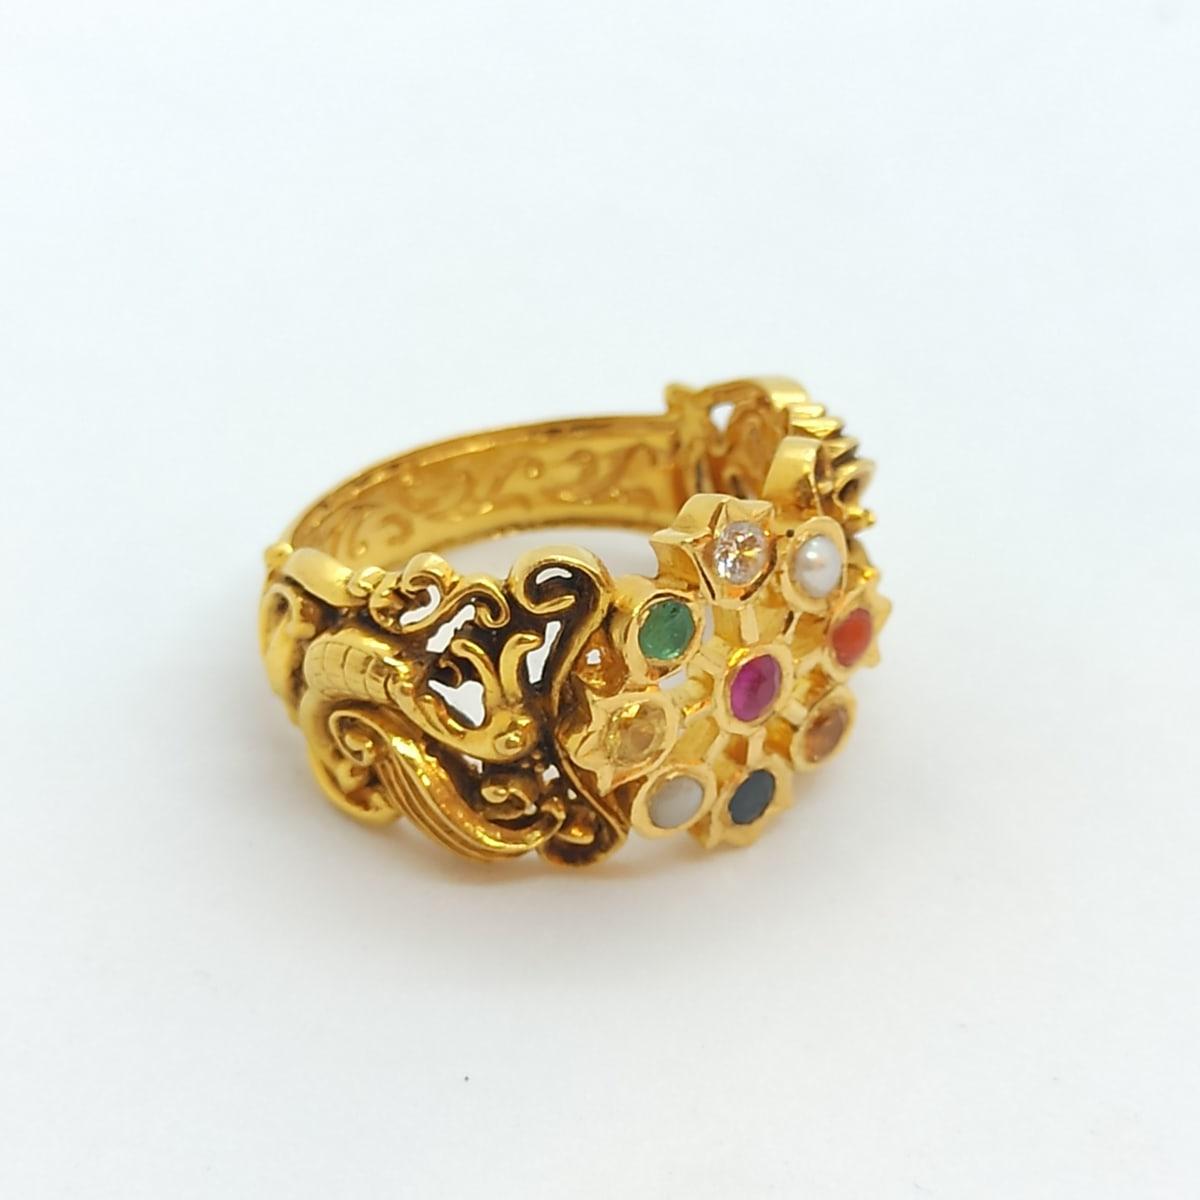 Navrathna Antique Ring